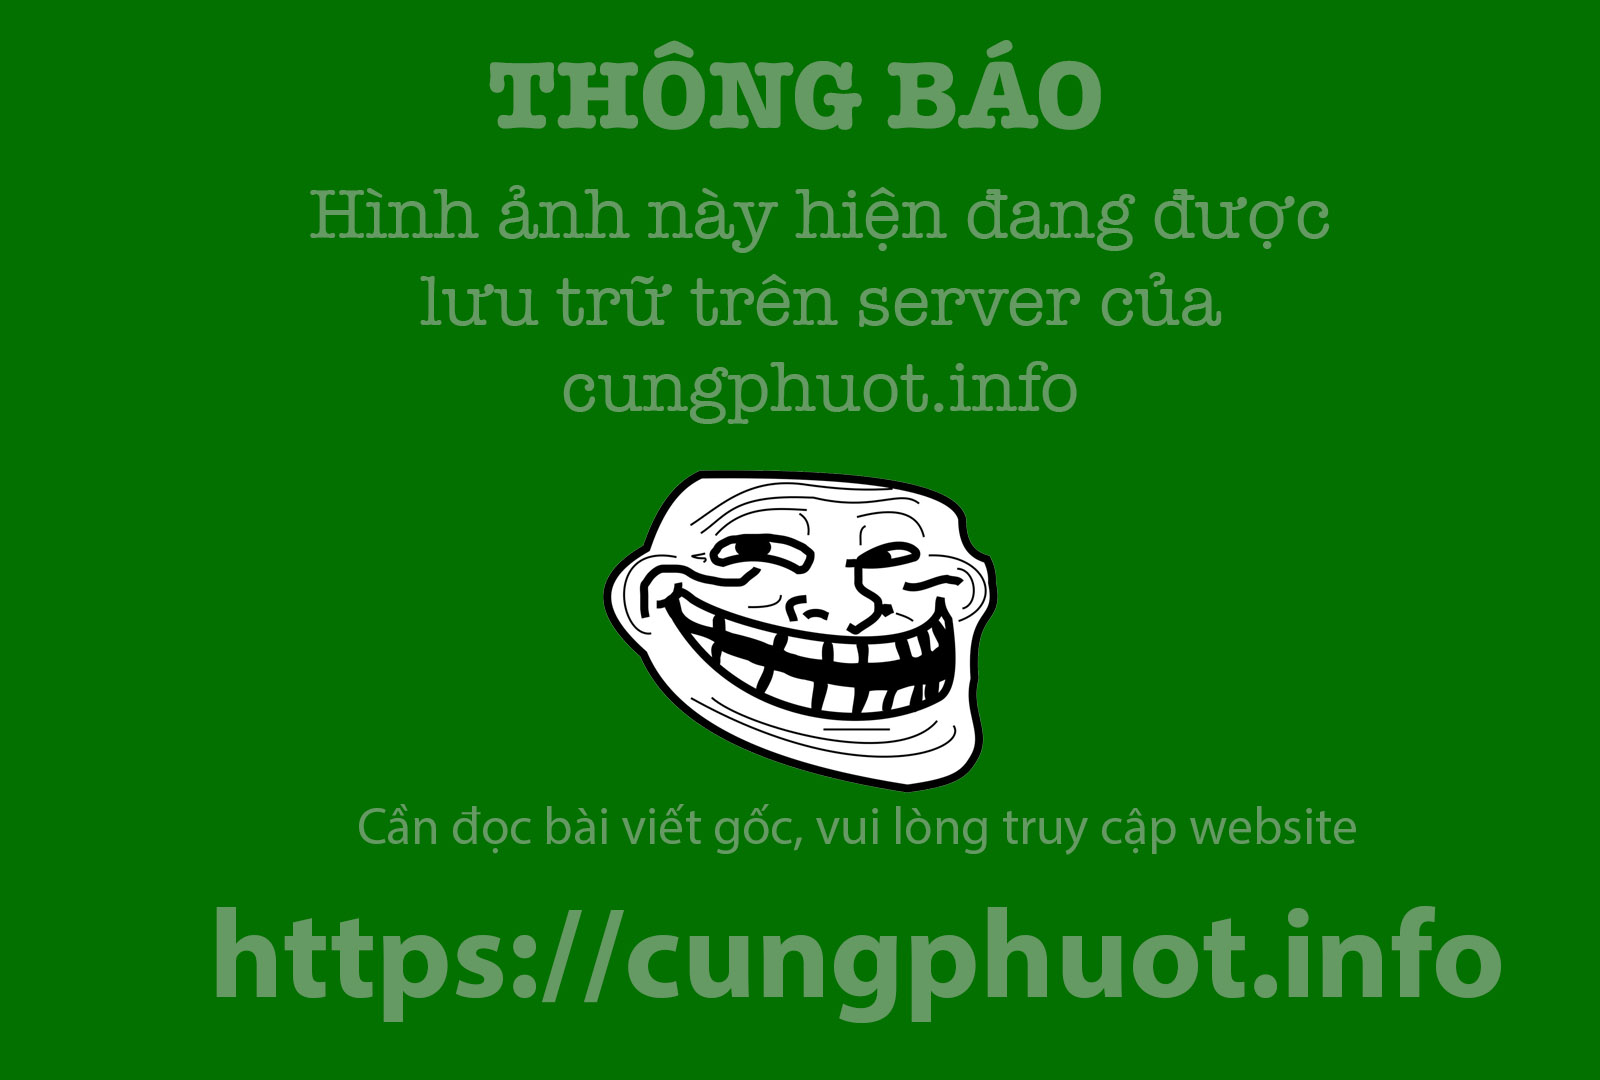 Dan phuot me man ve dep ky vi cua hang Prai o Quang Tri hinh anh 1